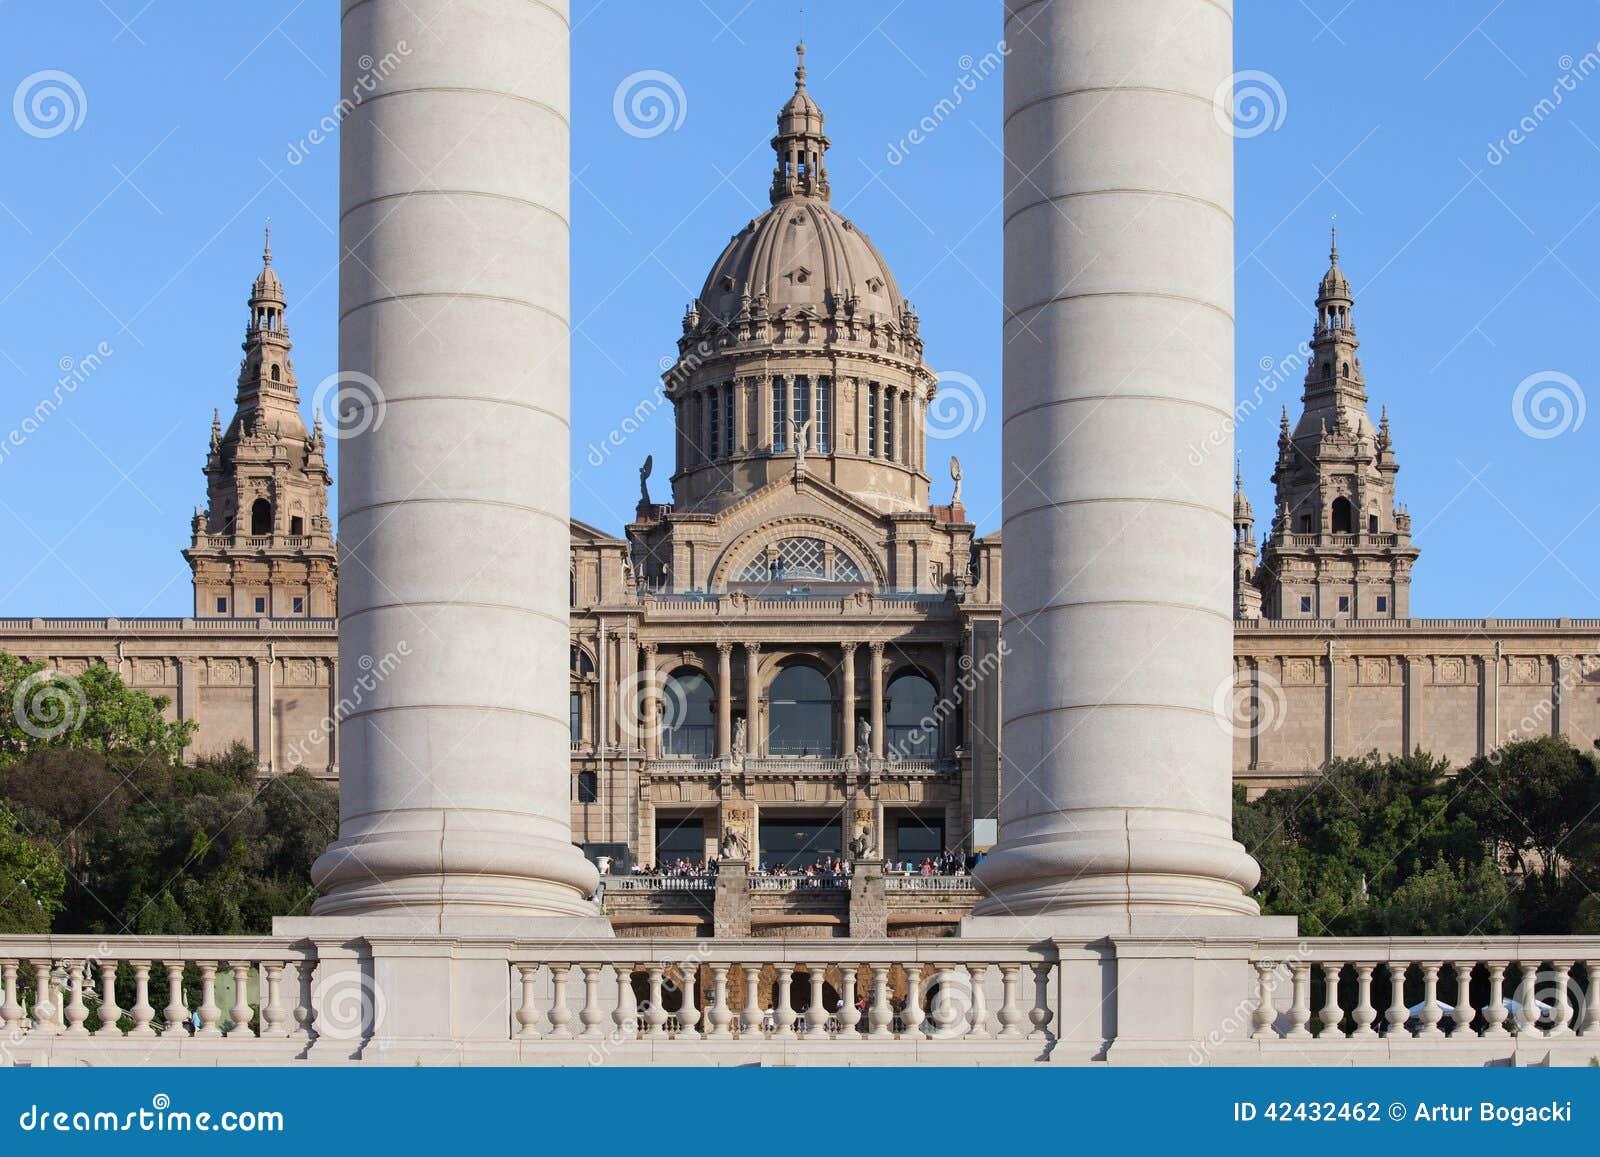 Museo de arte nacional de Cataluña en Barcelona